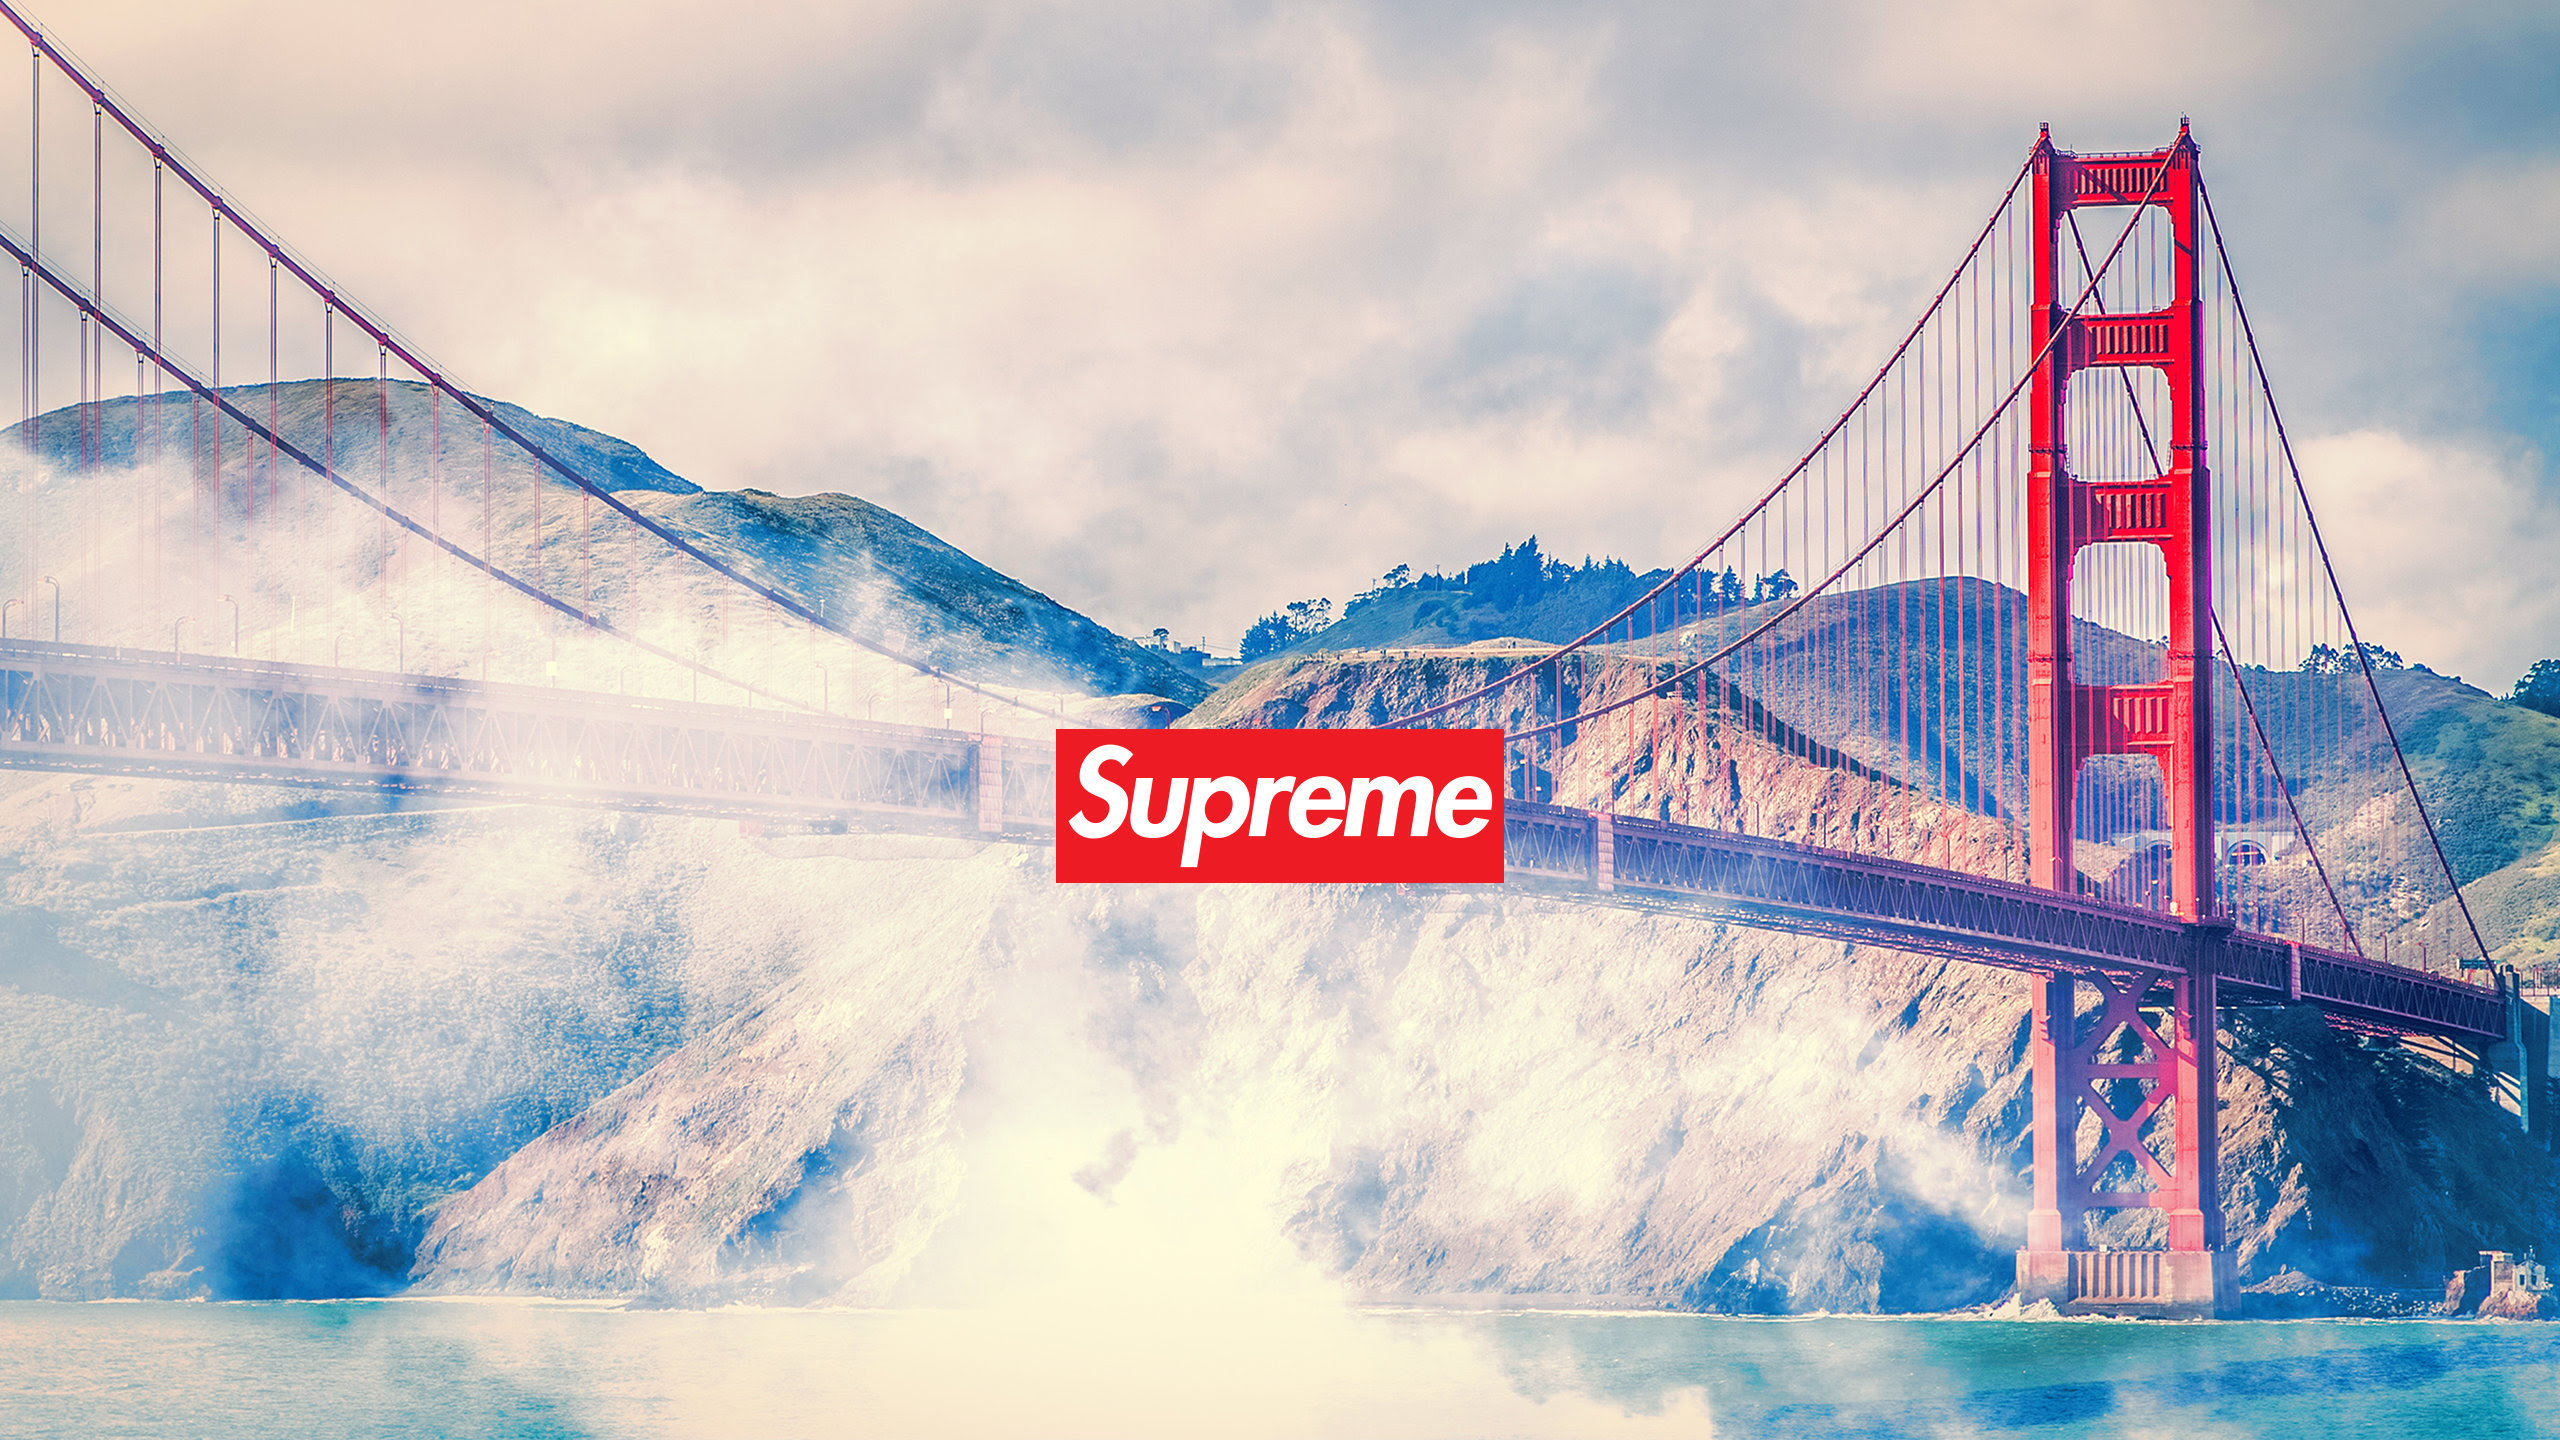 Supreme Wallpapers - Download Supreme HD Wallpapers